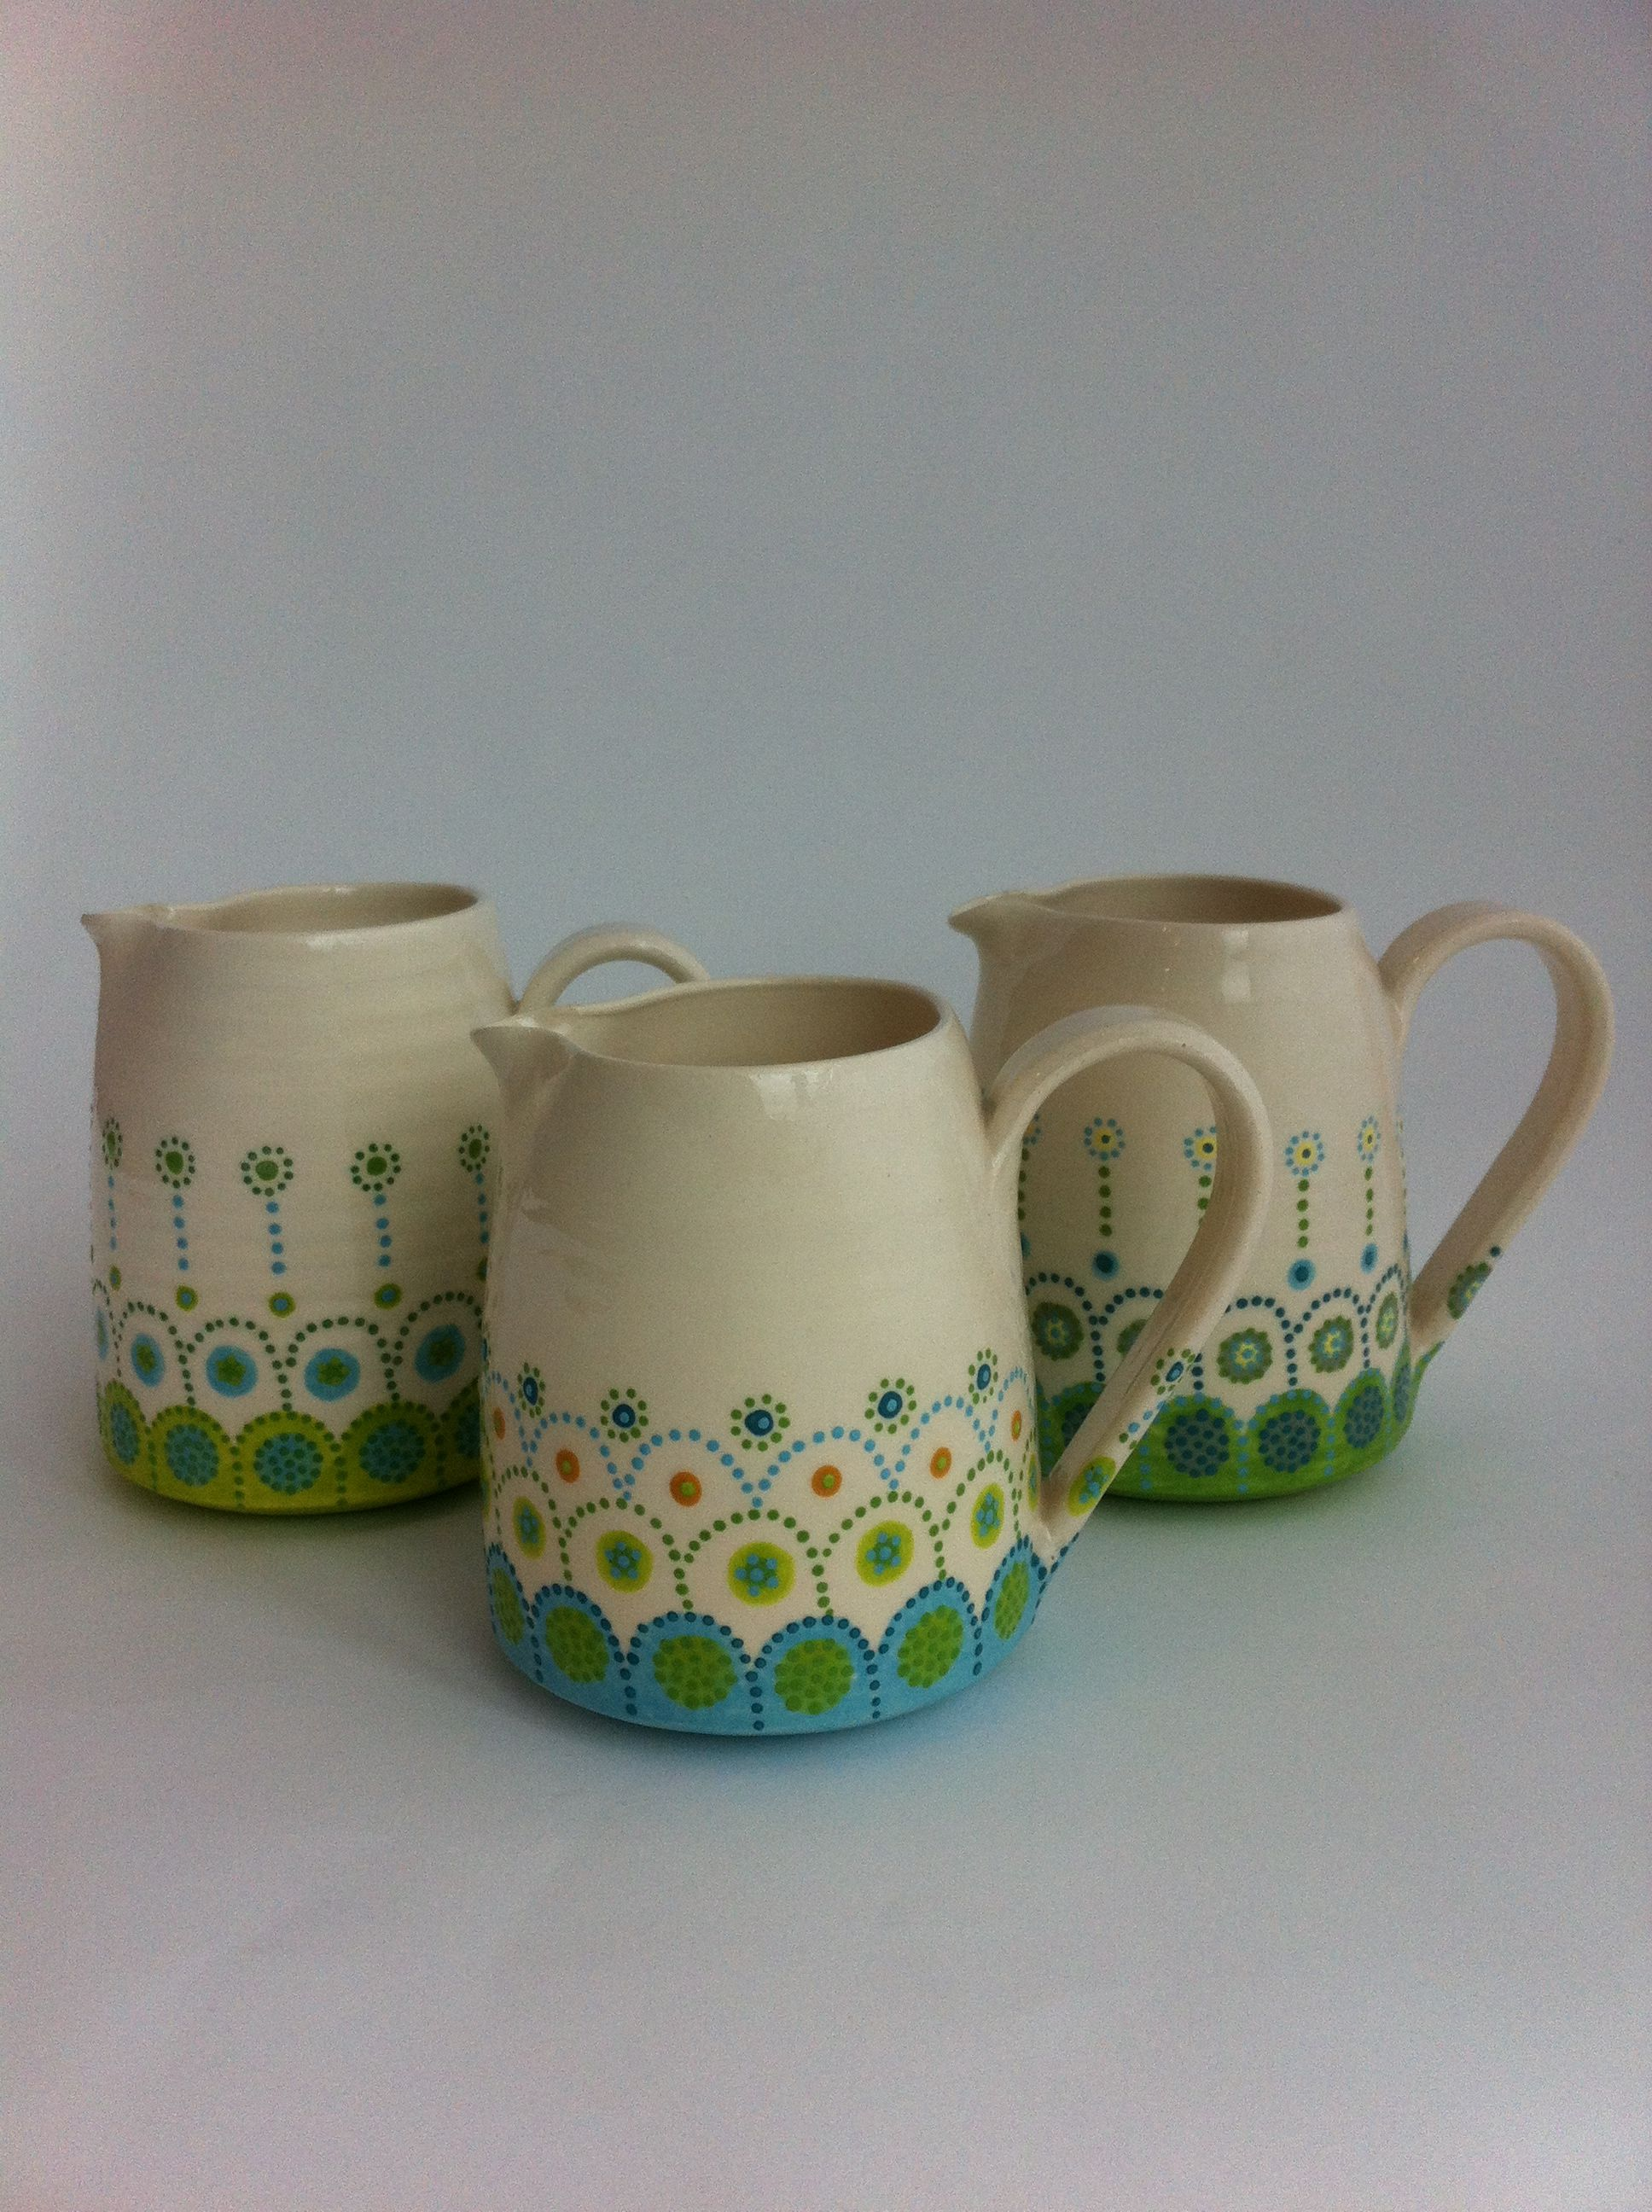 jugs by Katrin Moye